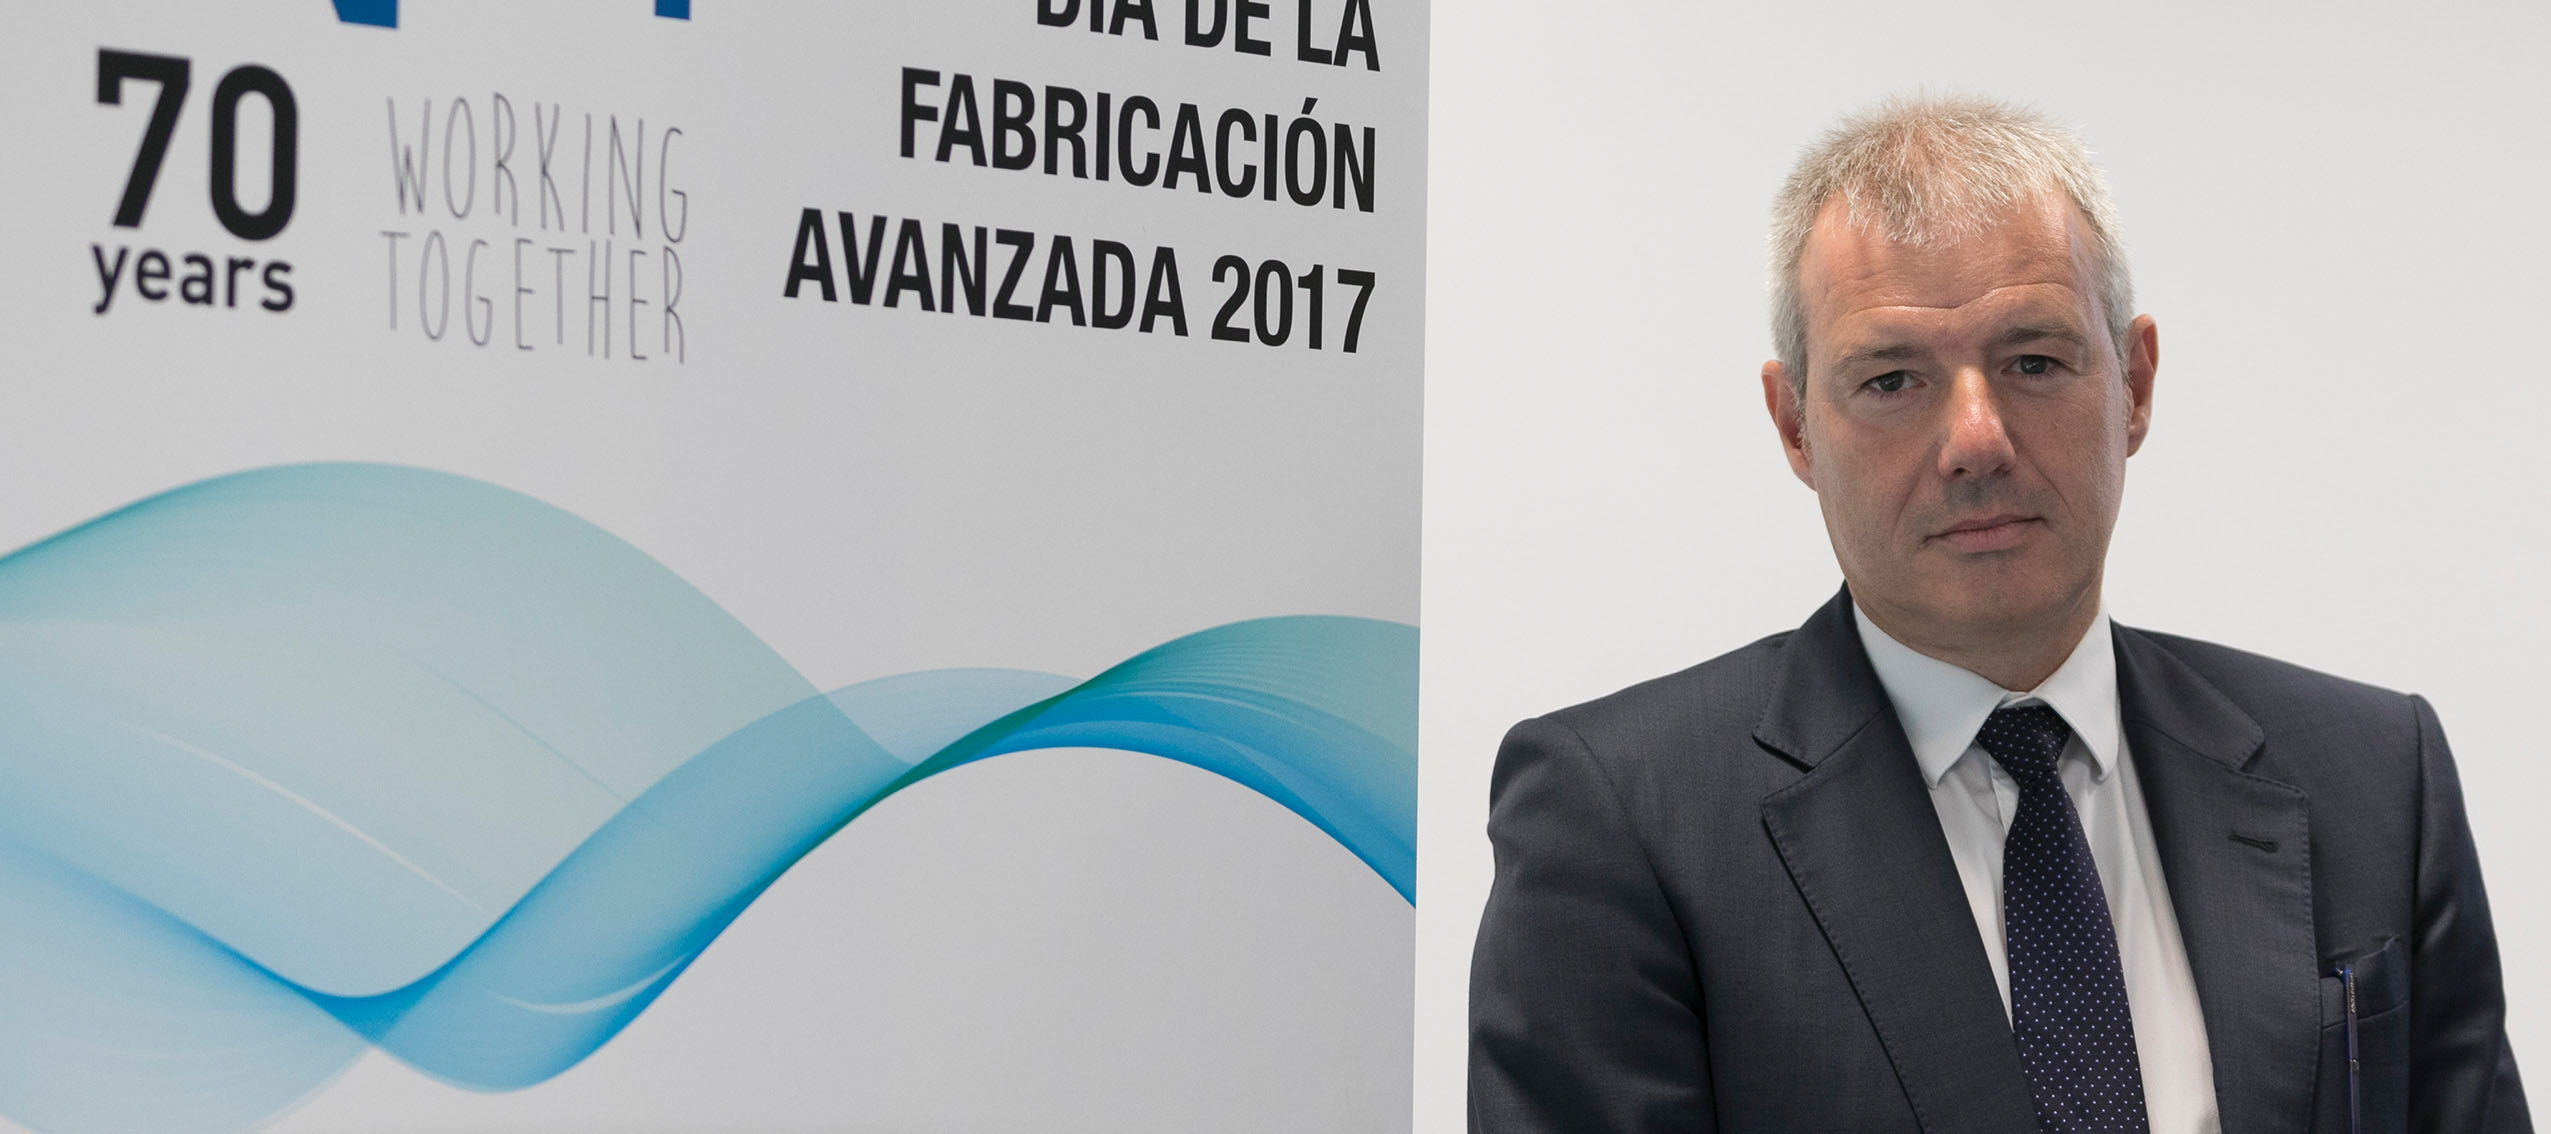 Alfonso Urzainki from EGILE CORPORATION XXI, new president of ADDIMAT